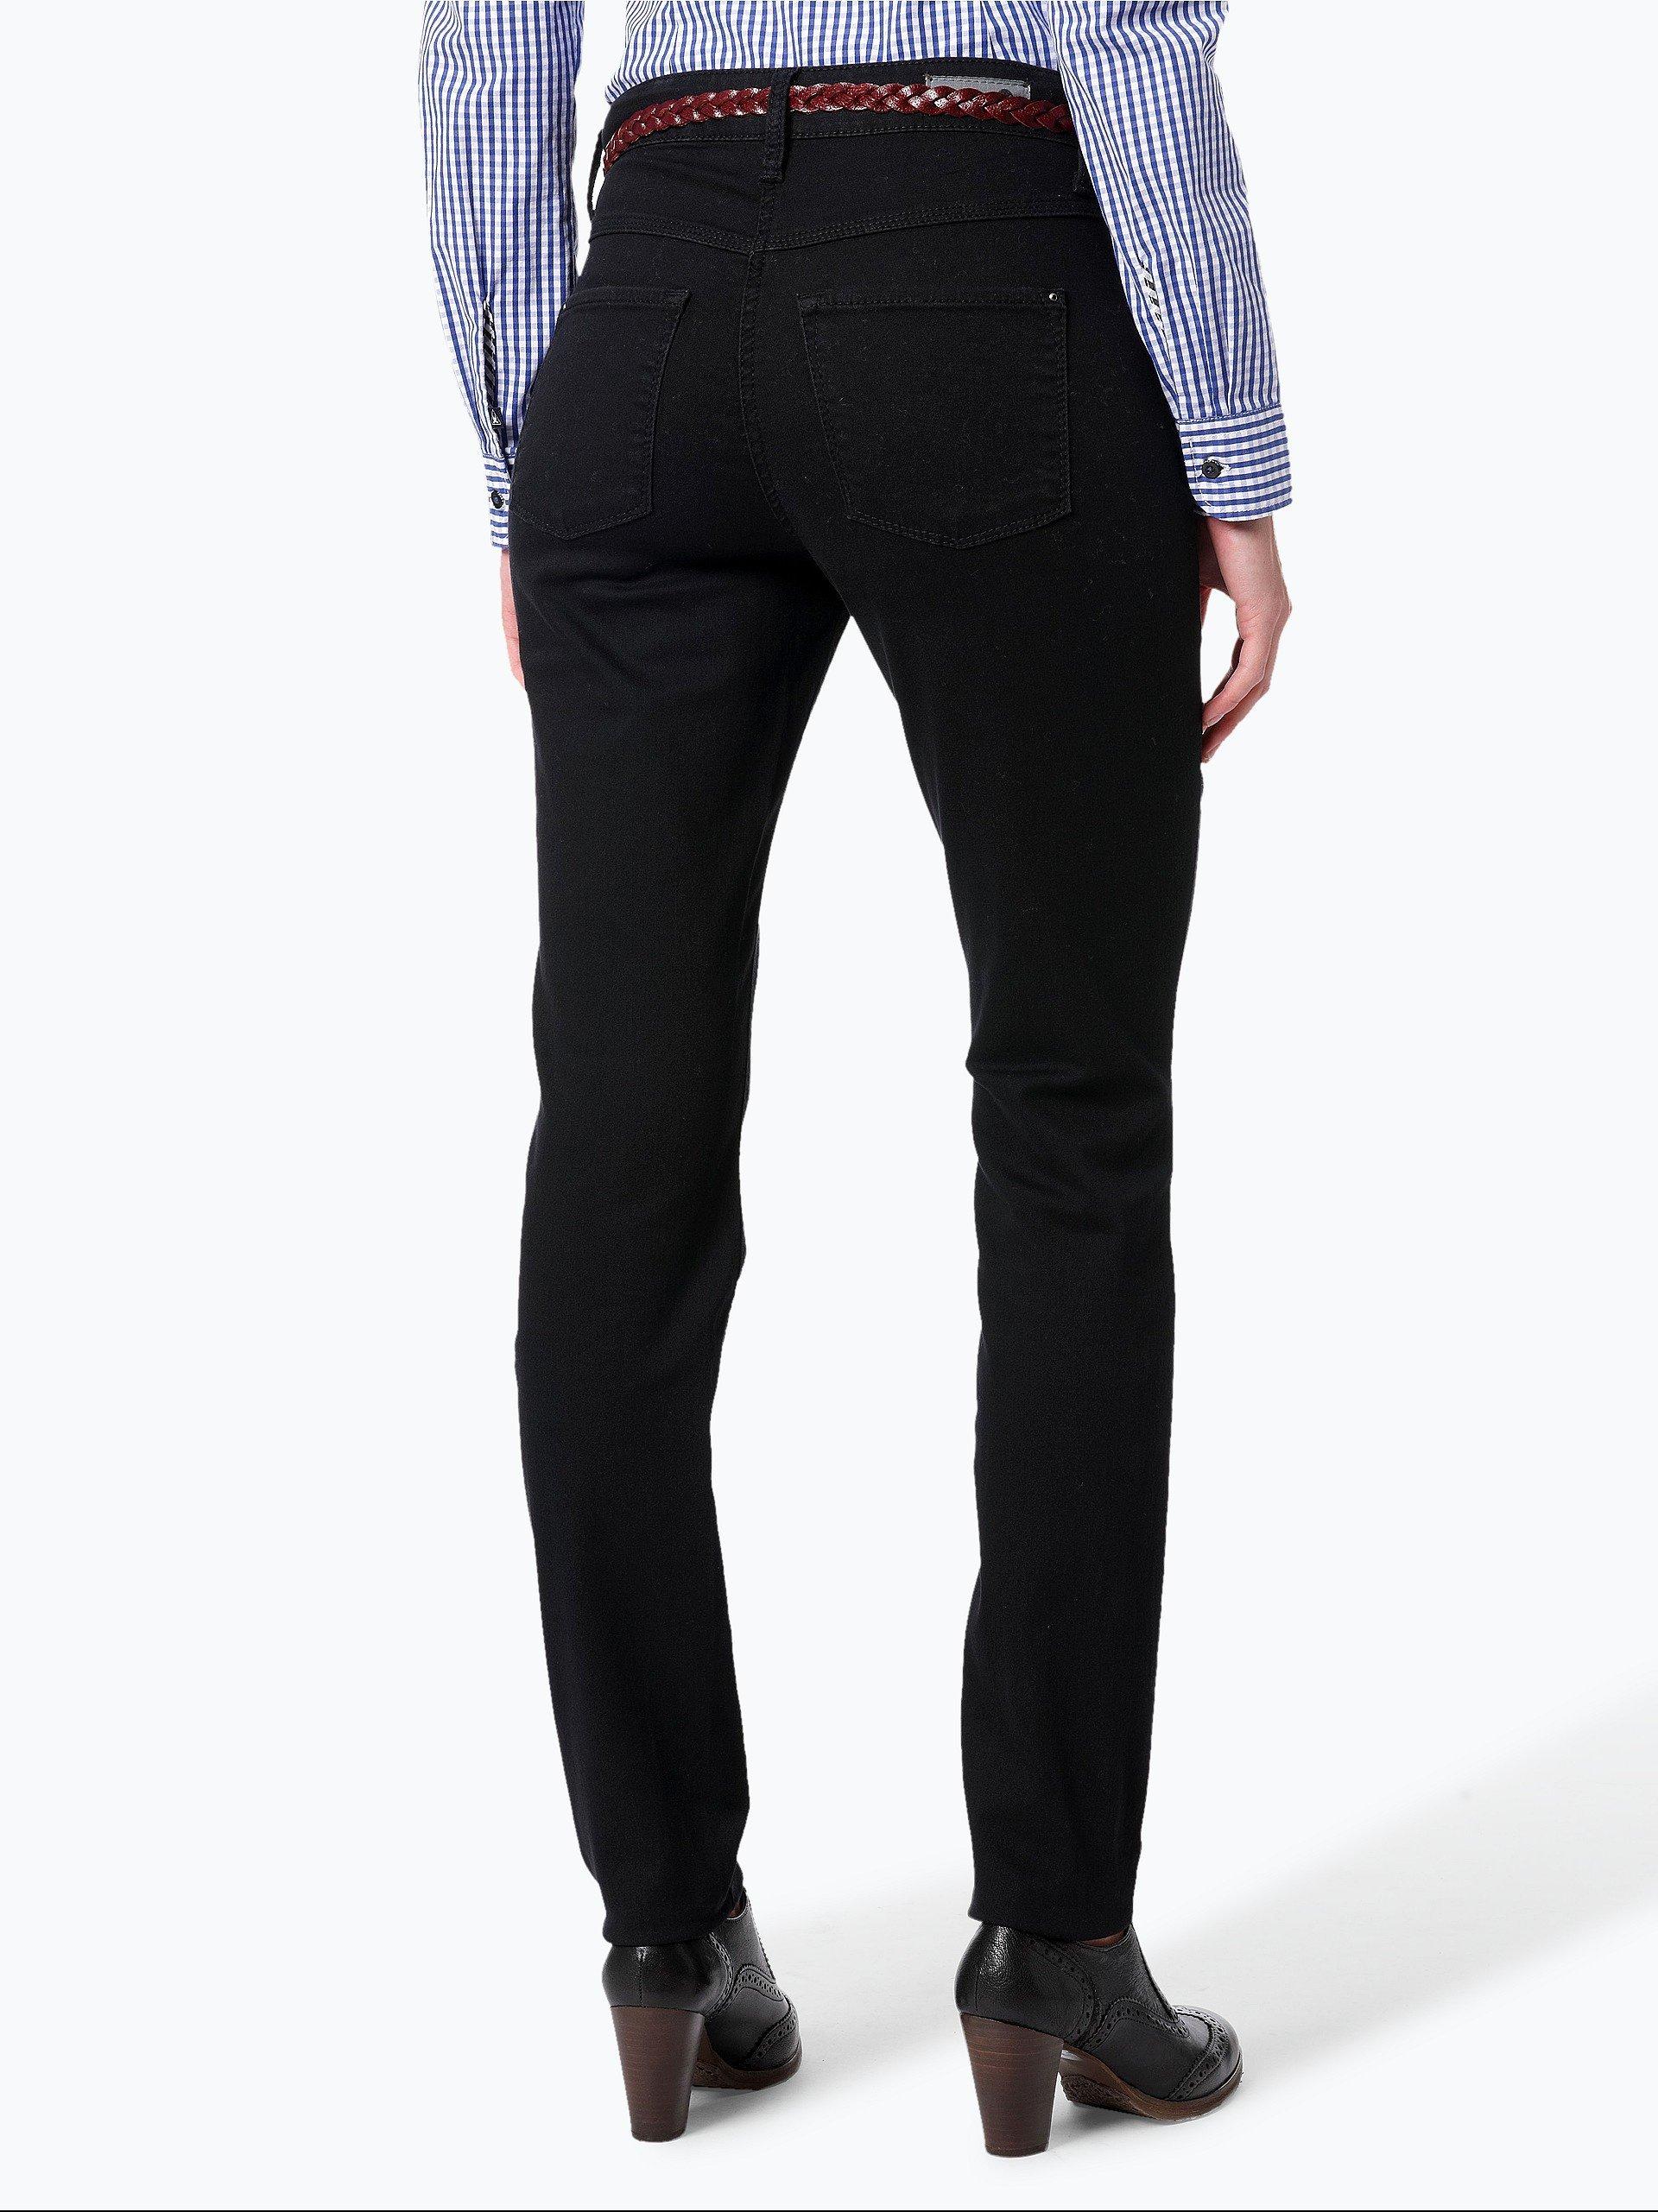 mac damen jeans dream skinny schwarz uni online kaufen. Black Bedroom Furniture Sets. Home Design Ideas